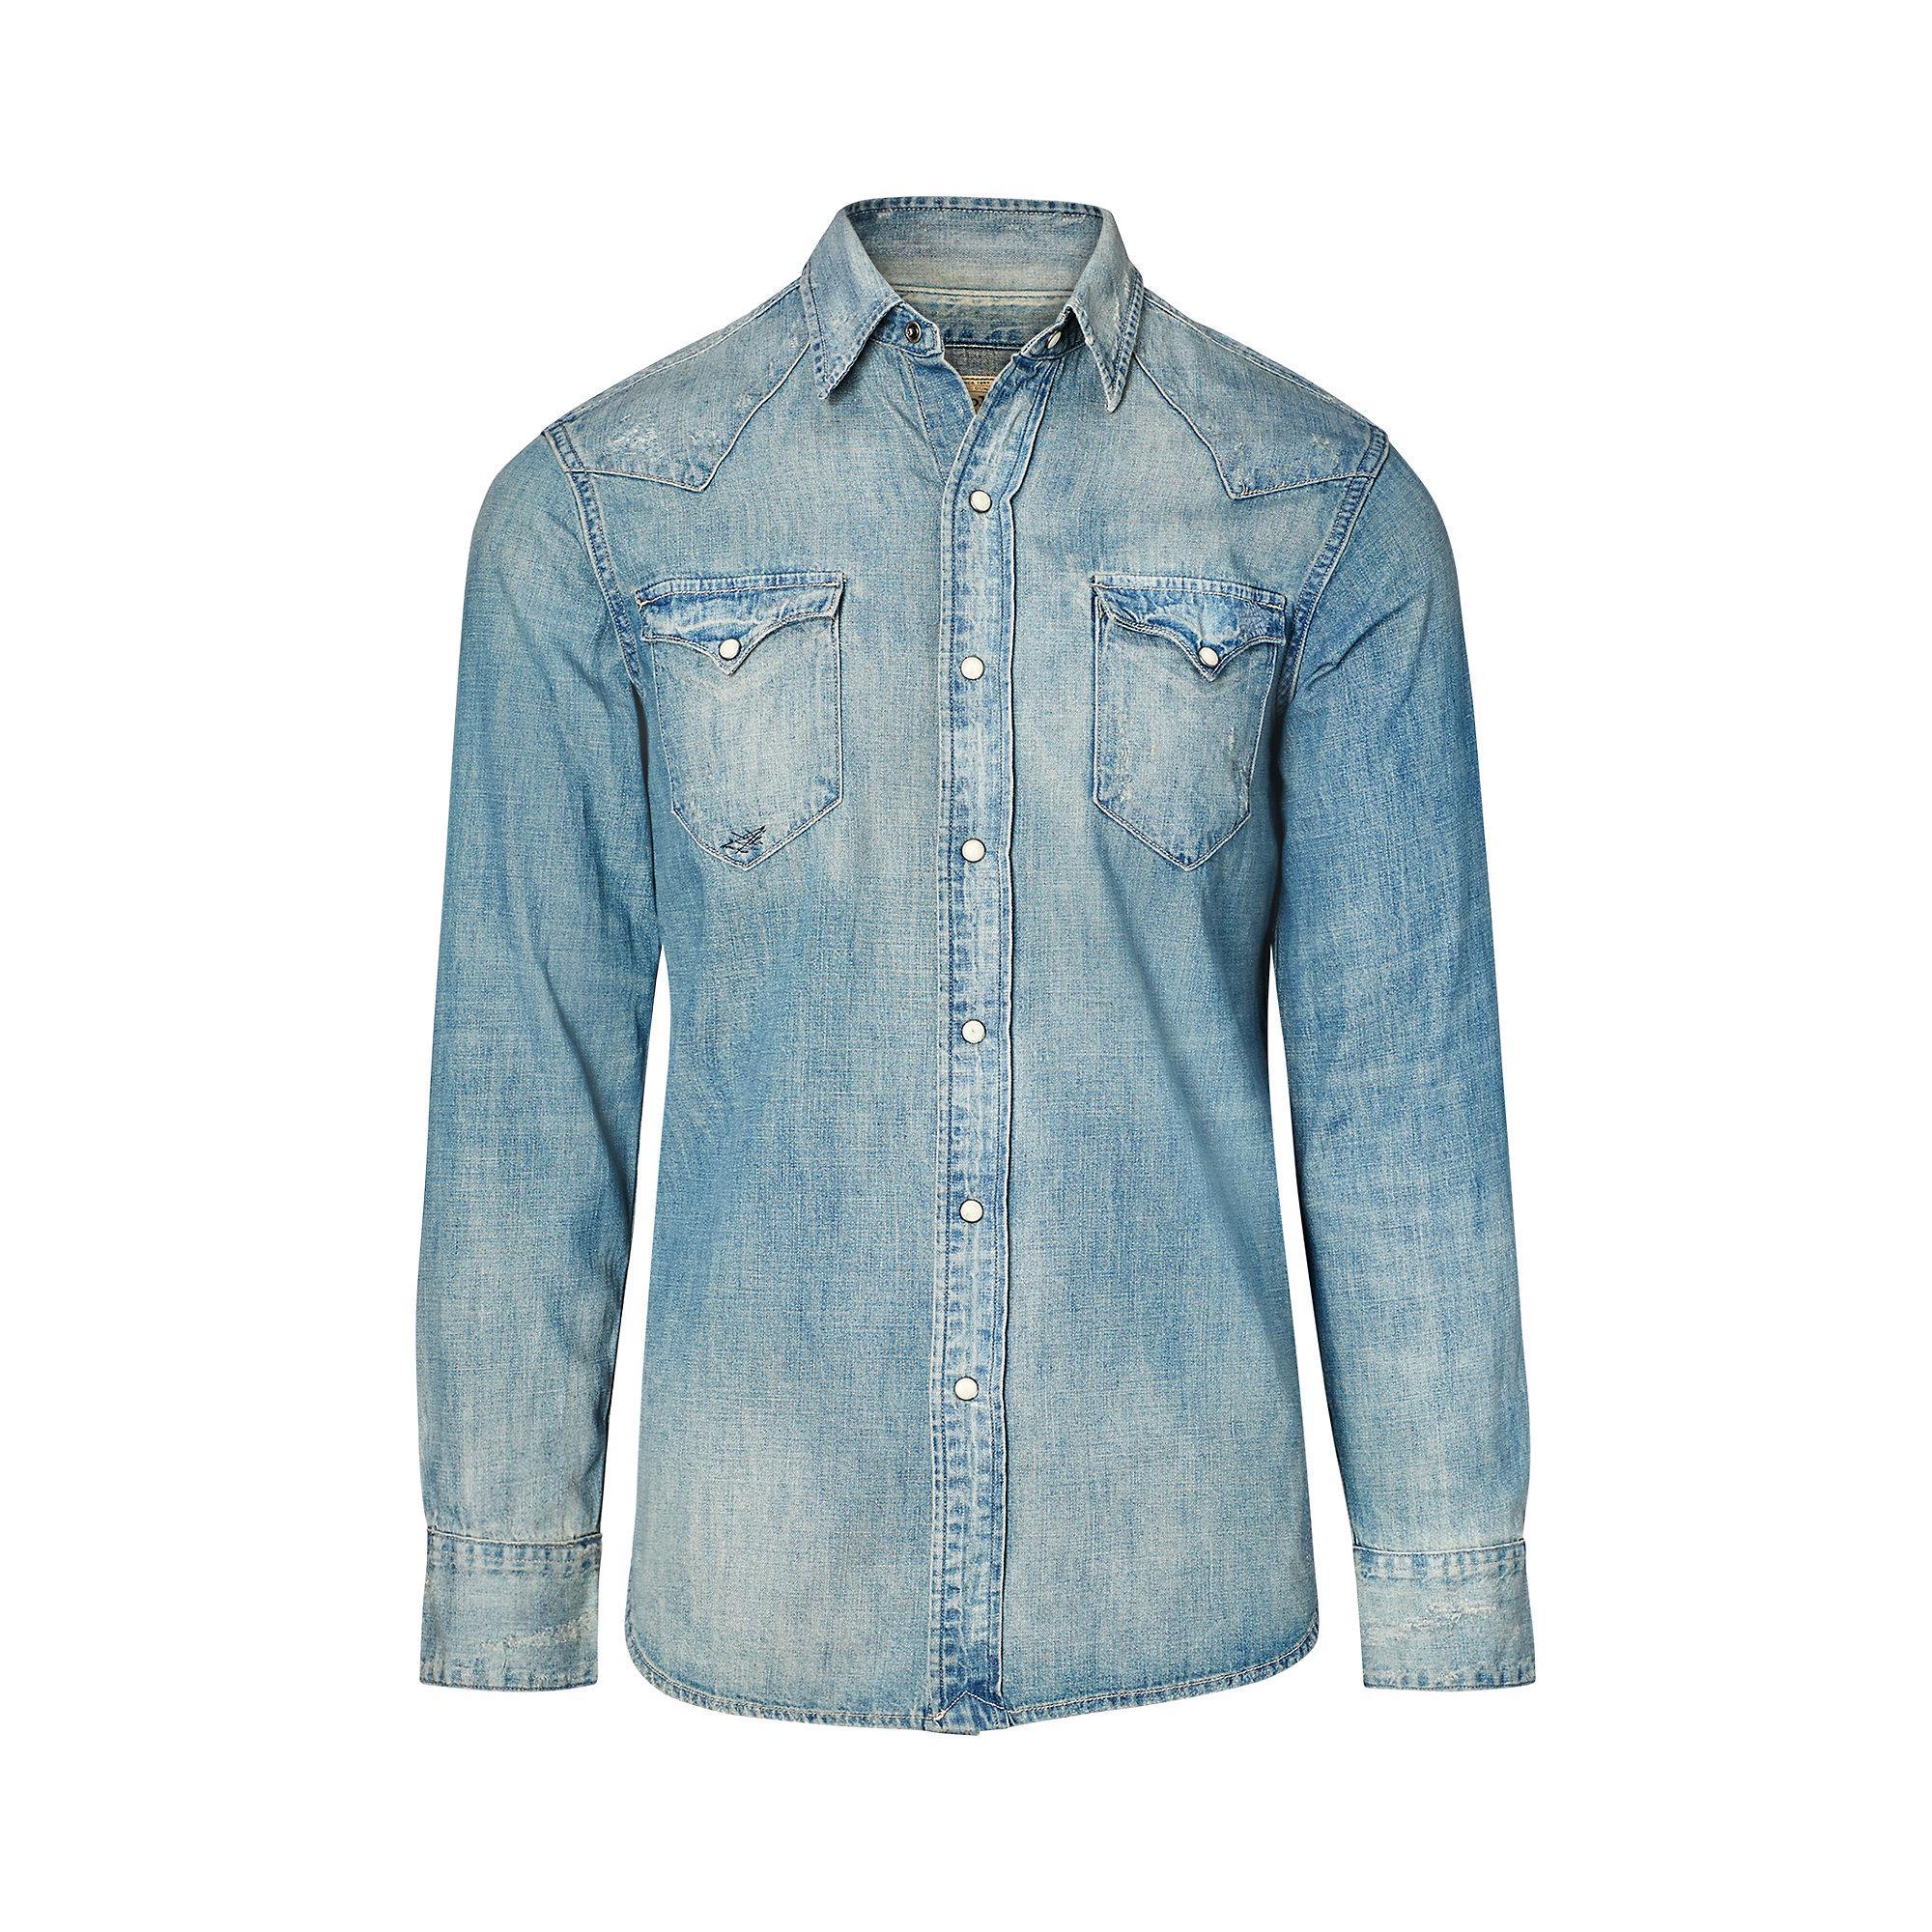 ae3569b0b7f Lyst - Polo Ralph Lauren Distressed Denim Western Shirt in Blue for Men